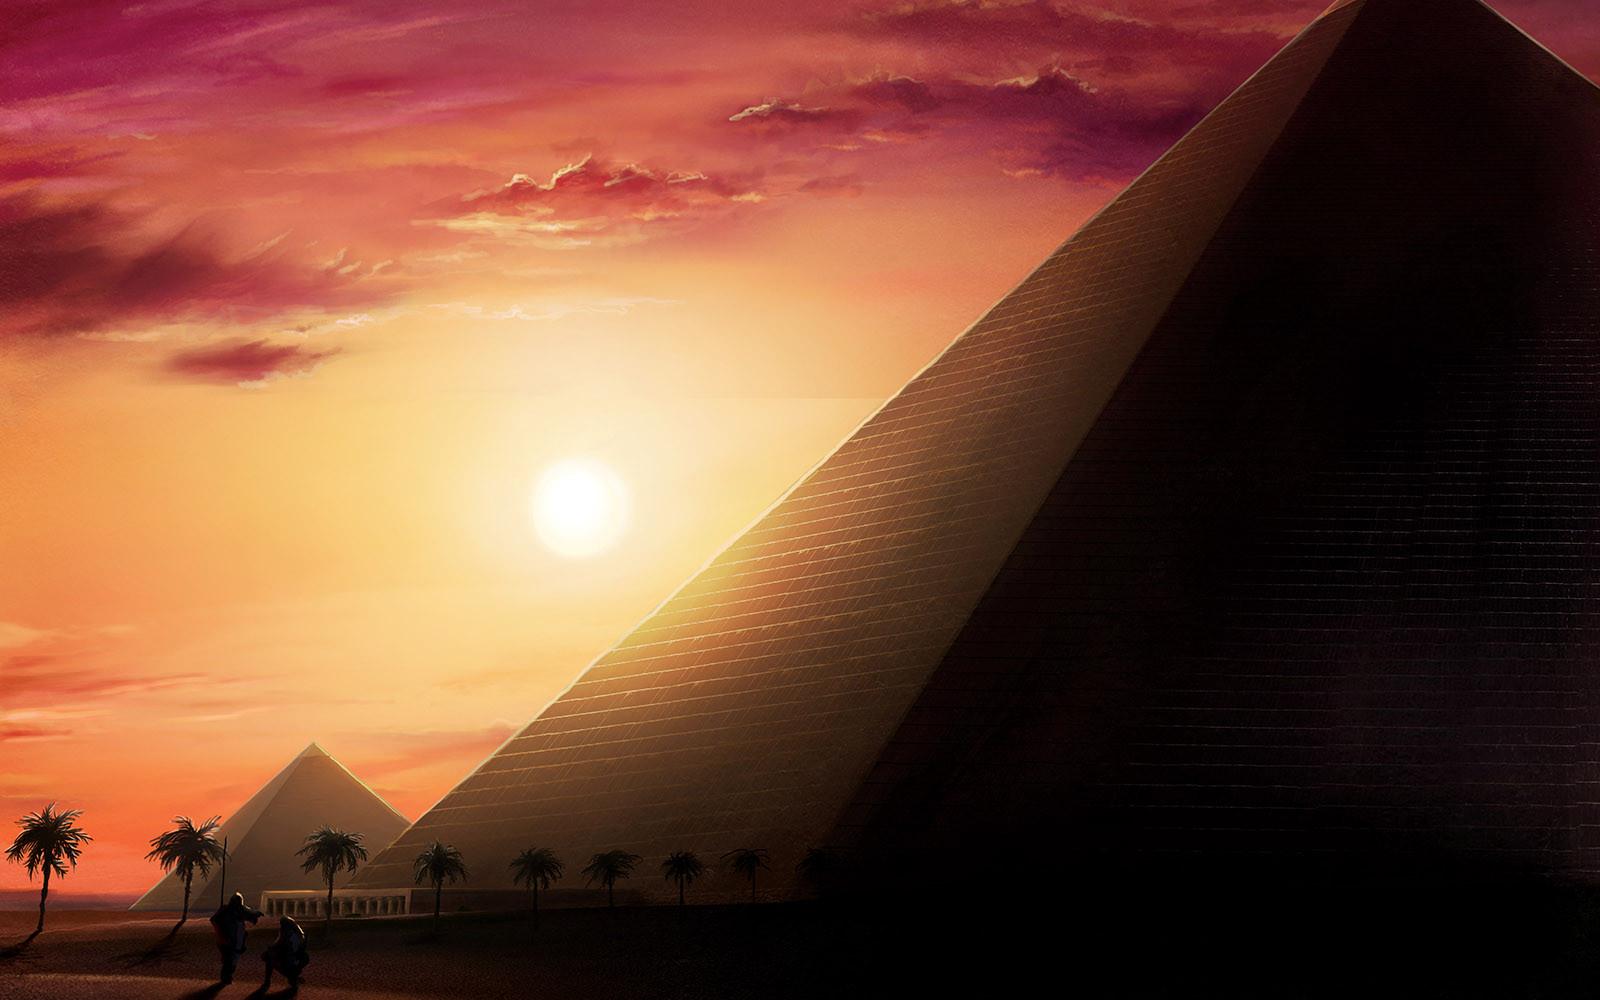 Bezier Games' mystery title. The Pyramids of Mad Pharaoh Tutankhamun?